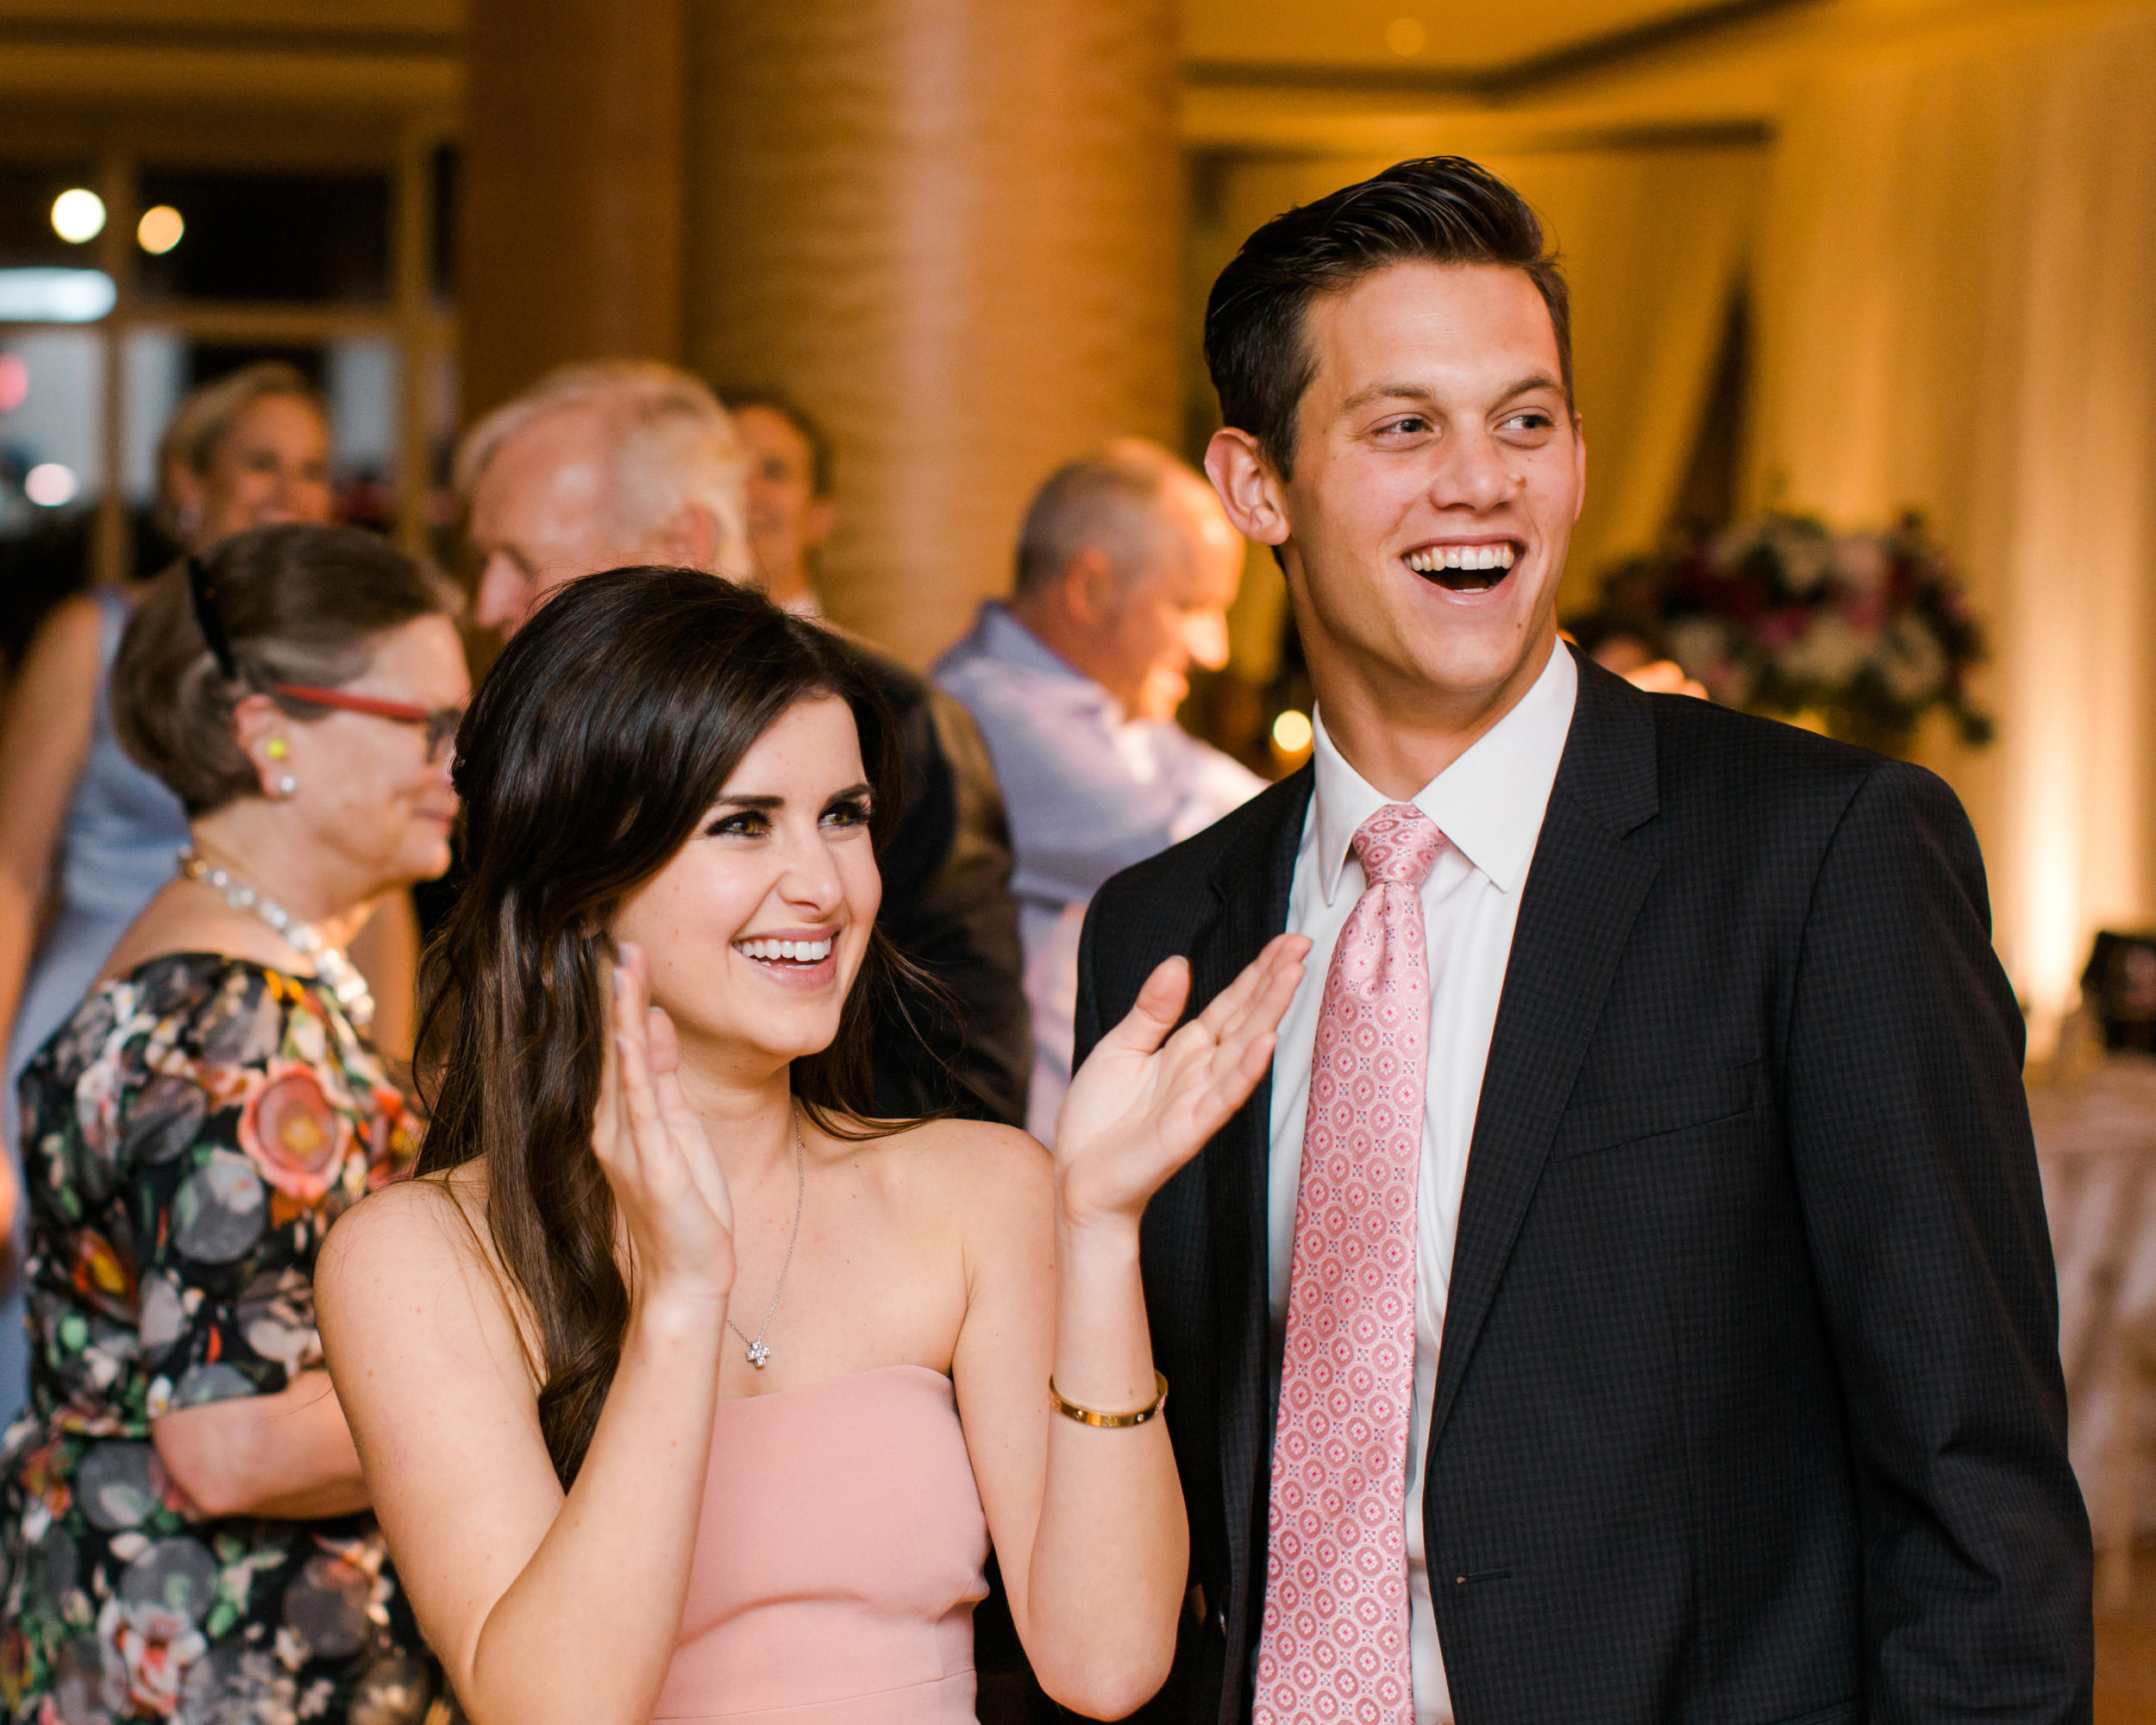 biltmore_santa_barbara_wedding_photos_coral_casino_067.jpg